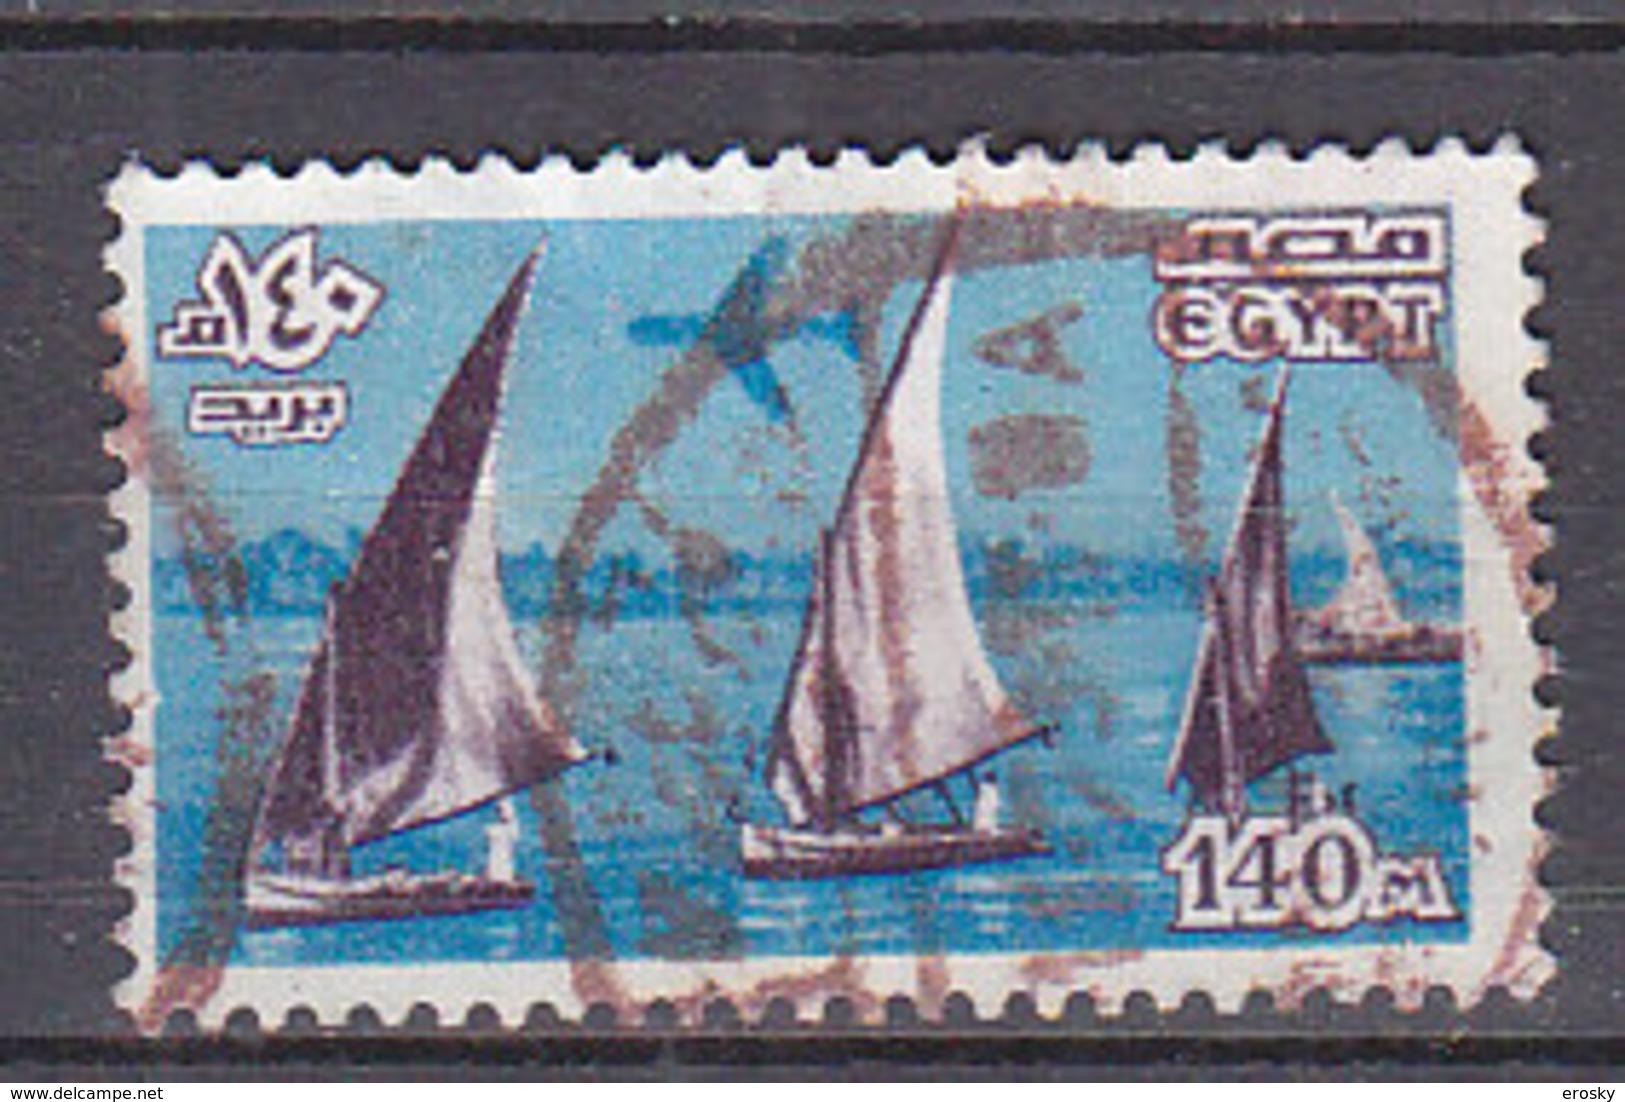 A0800 - EGYPTE EGYPT AERIENNE Yv N°162 - Poste Aérienne